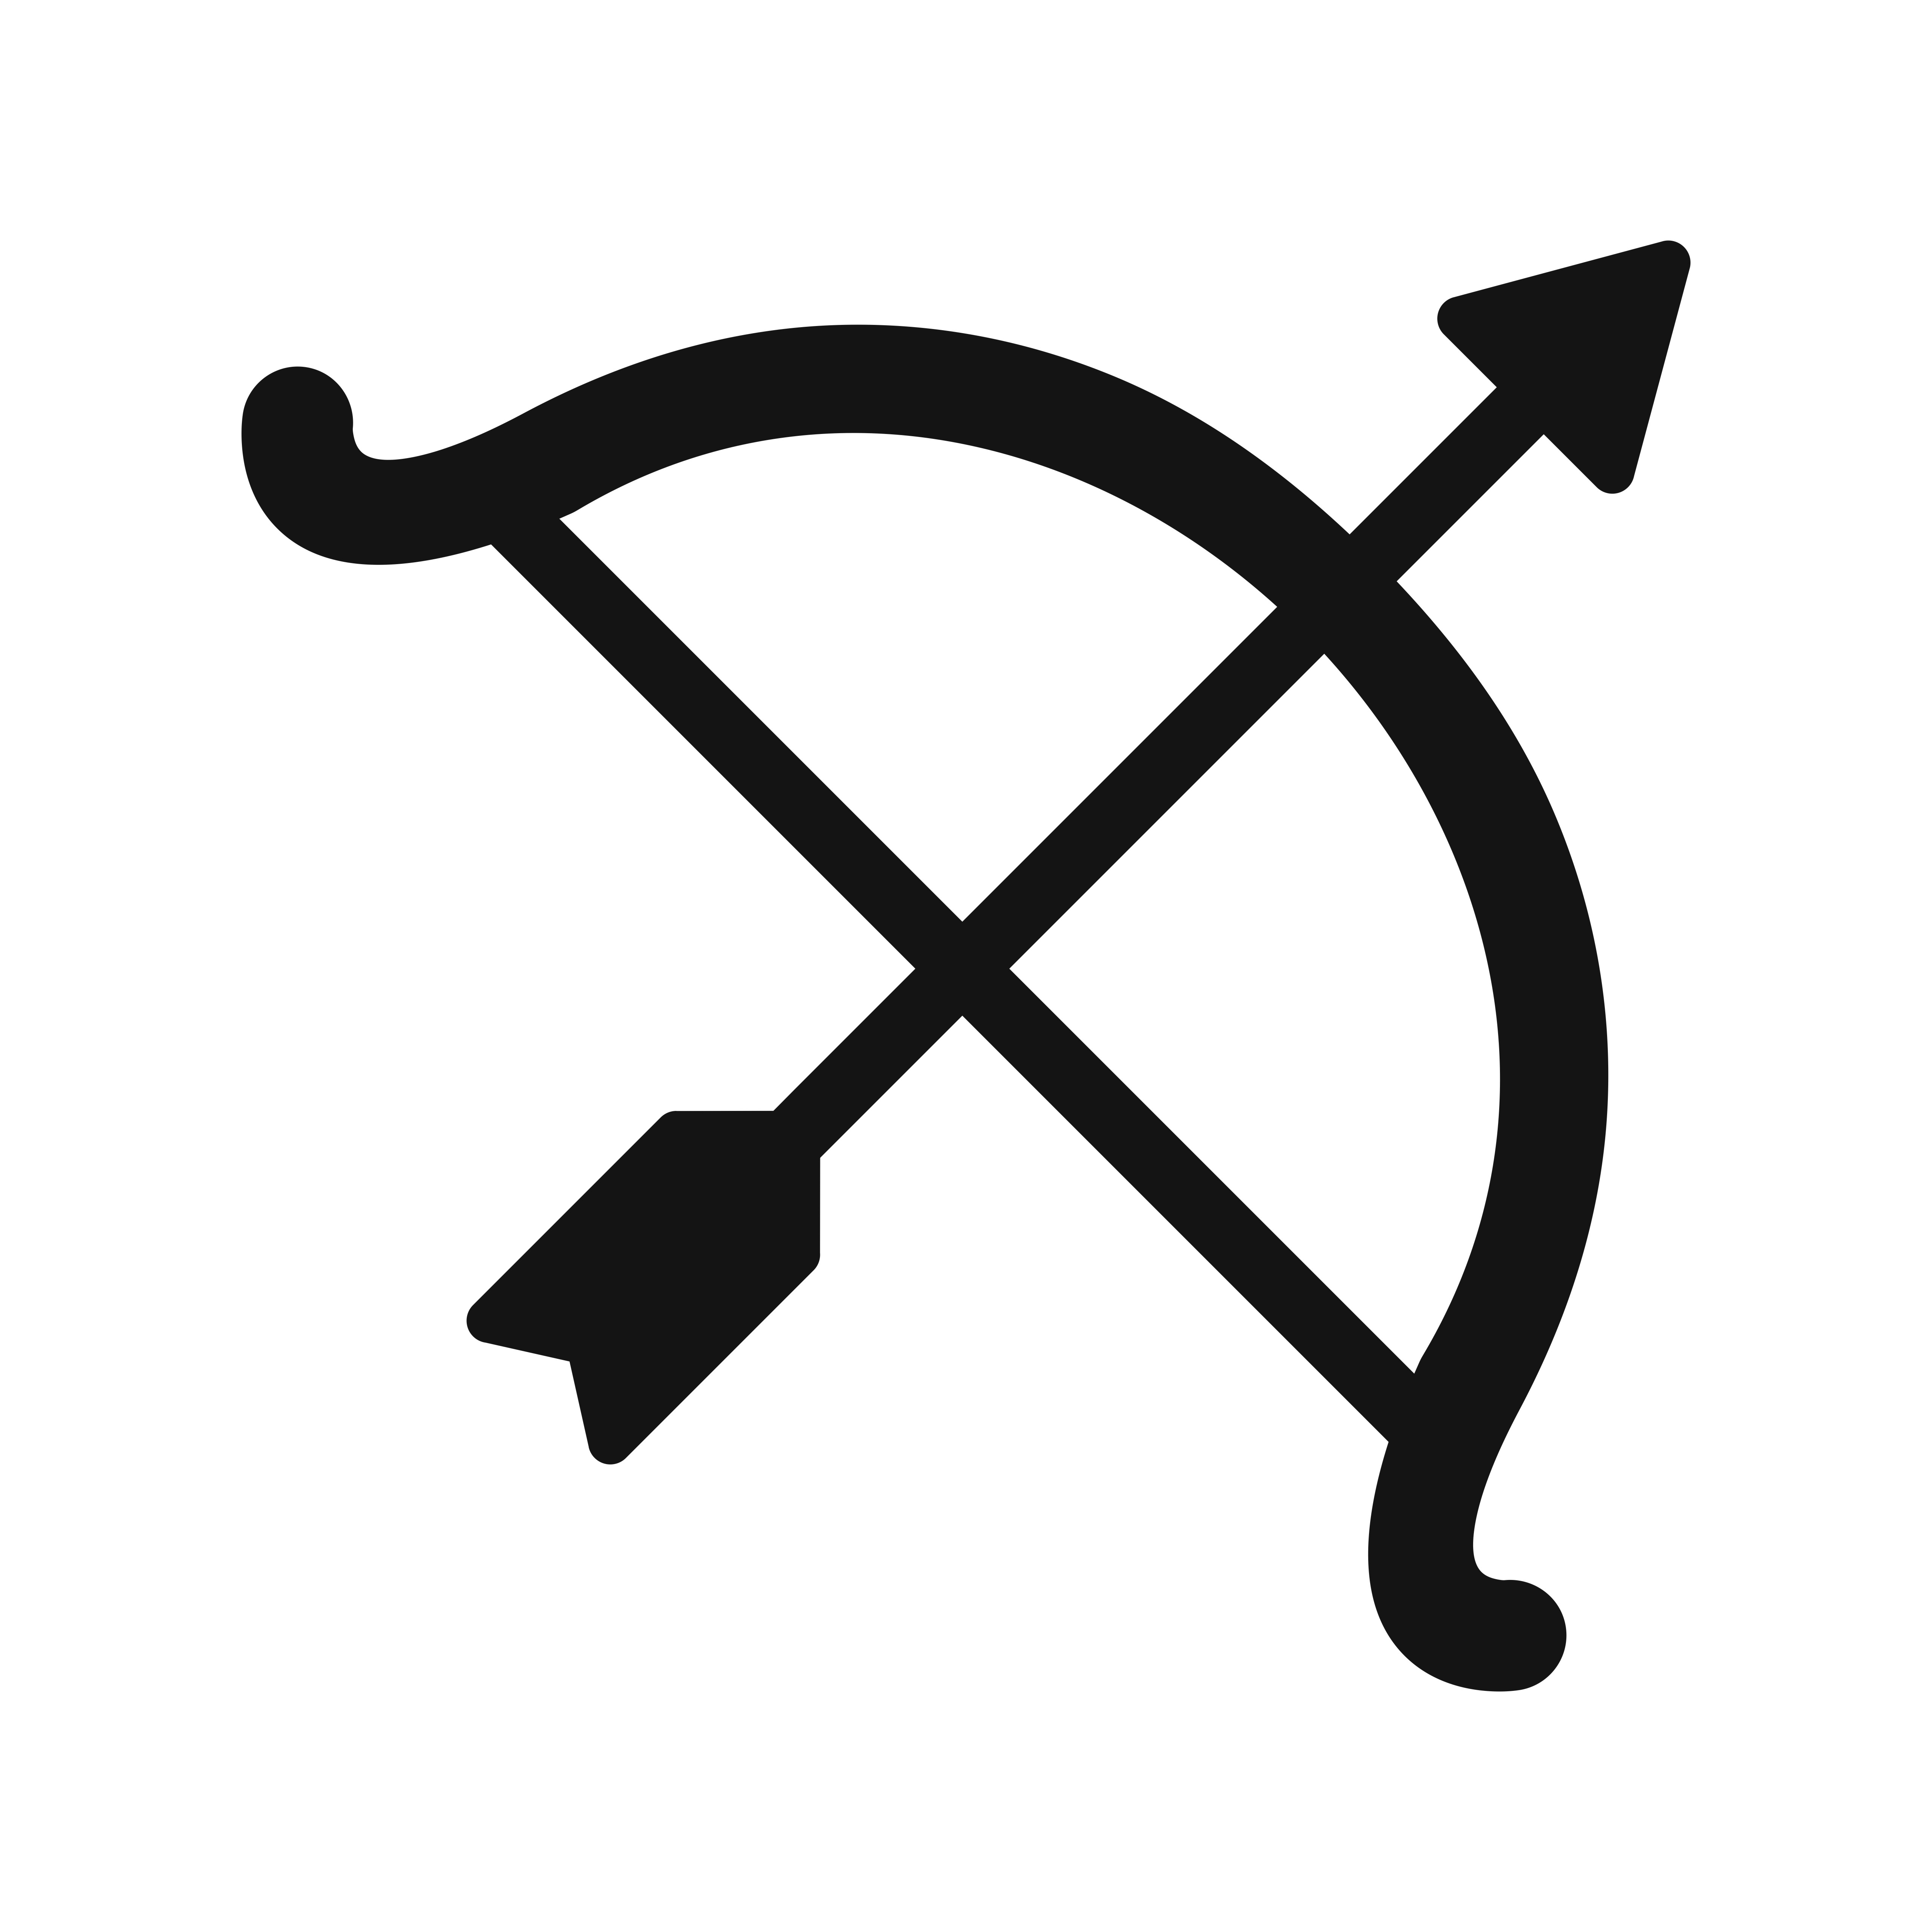 Bow Icon Vector Illustration - Download Free Vectors ...